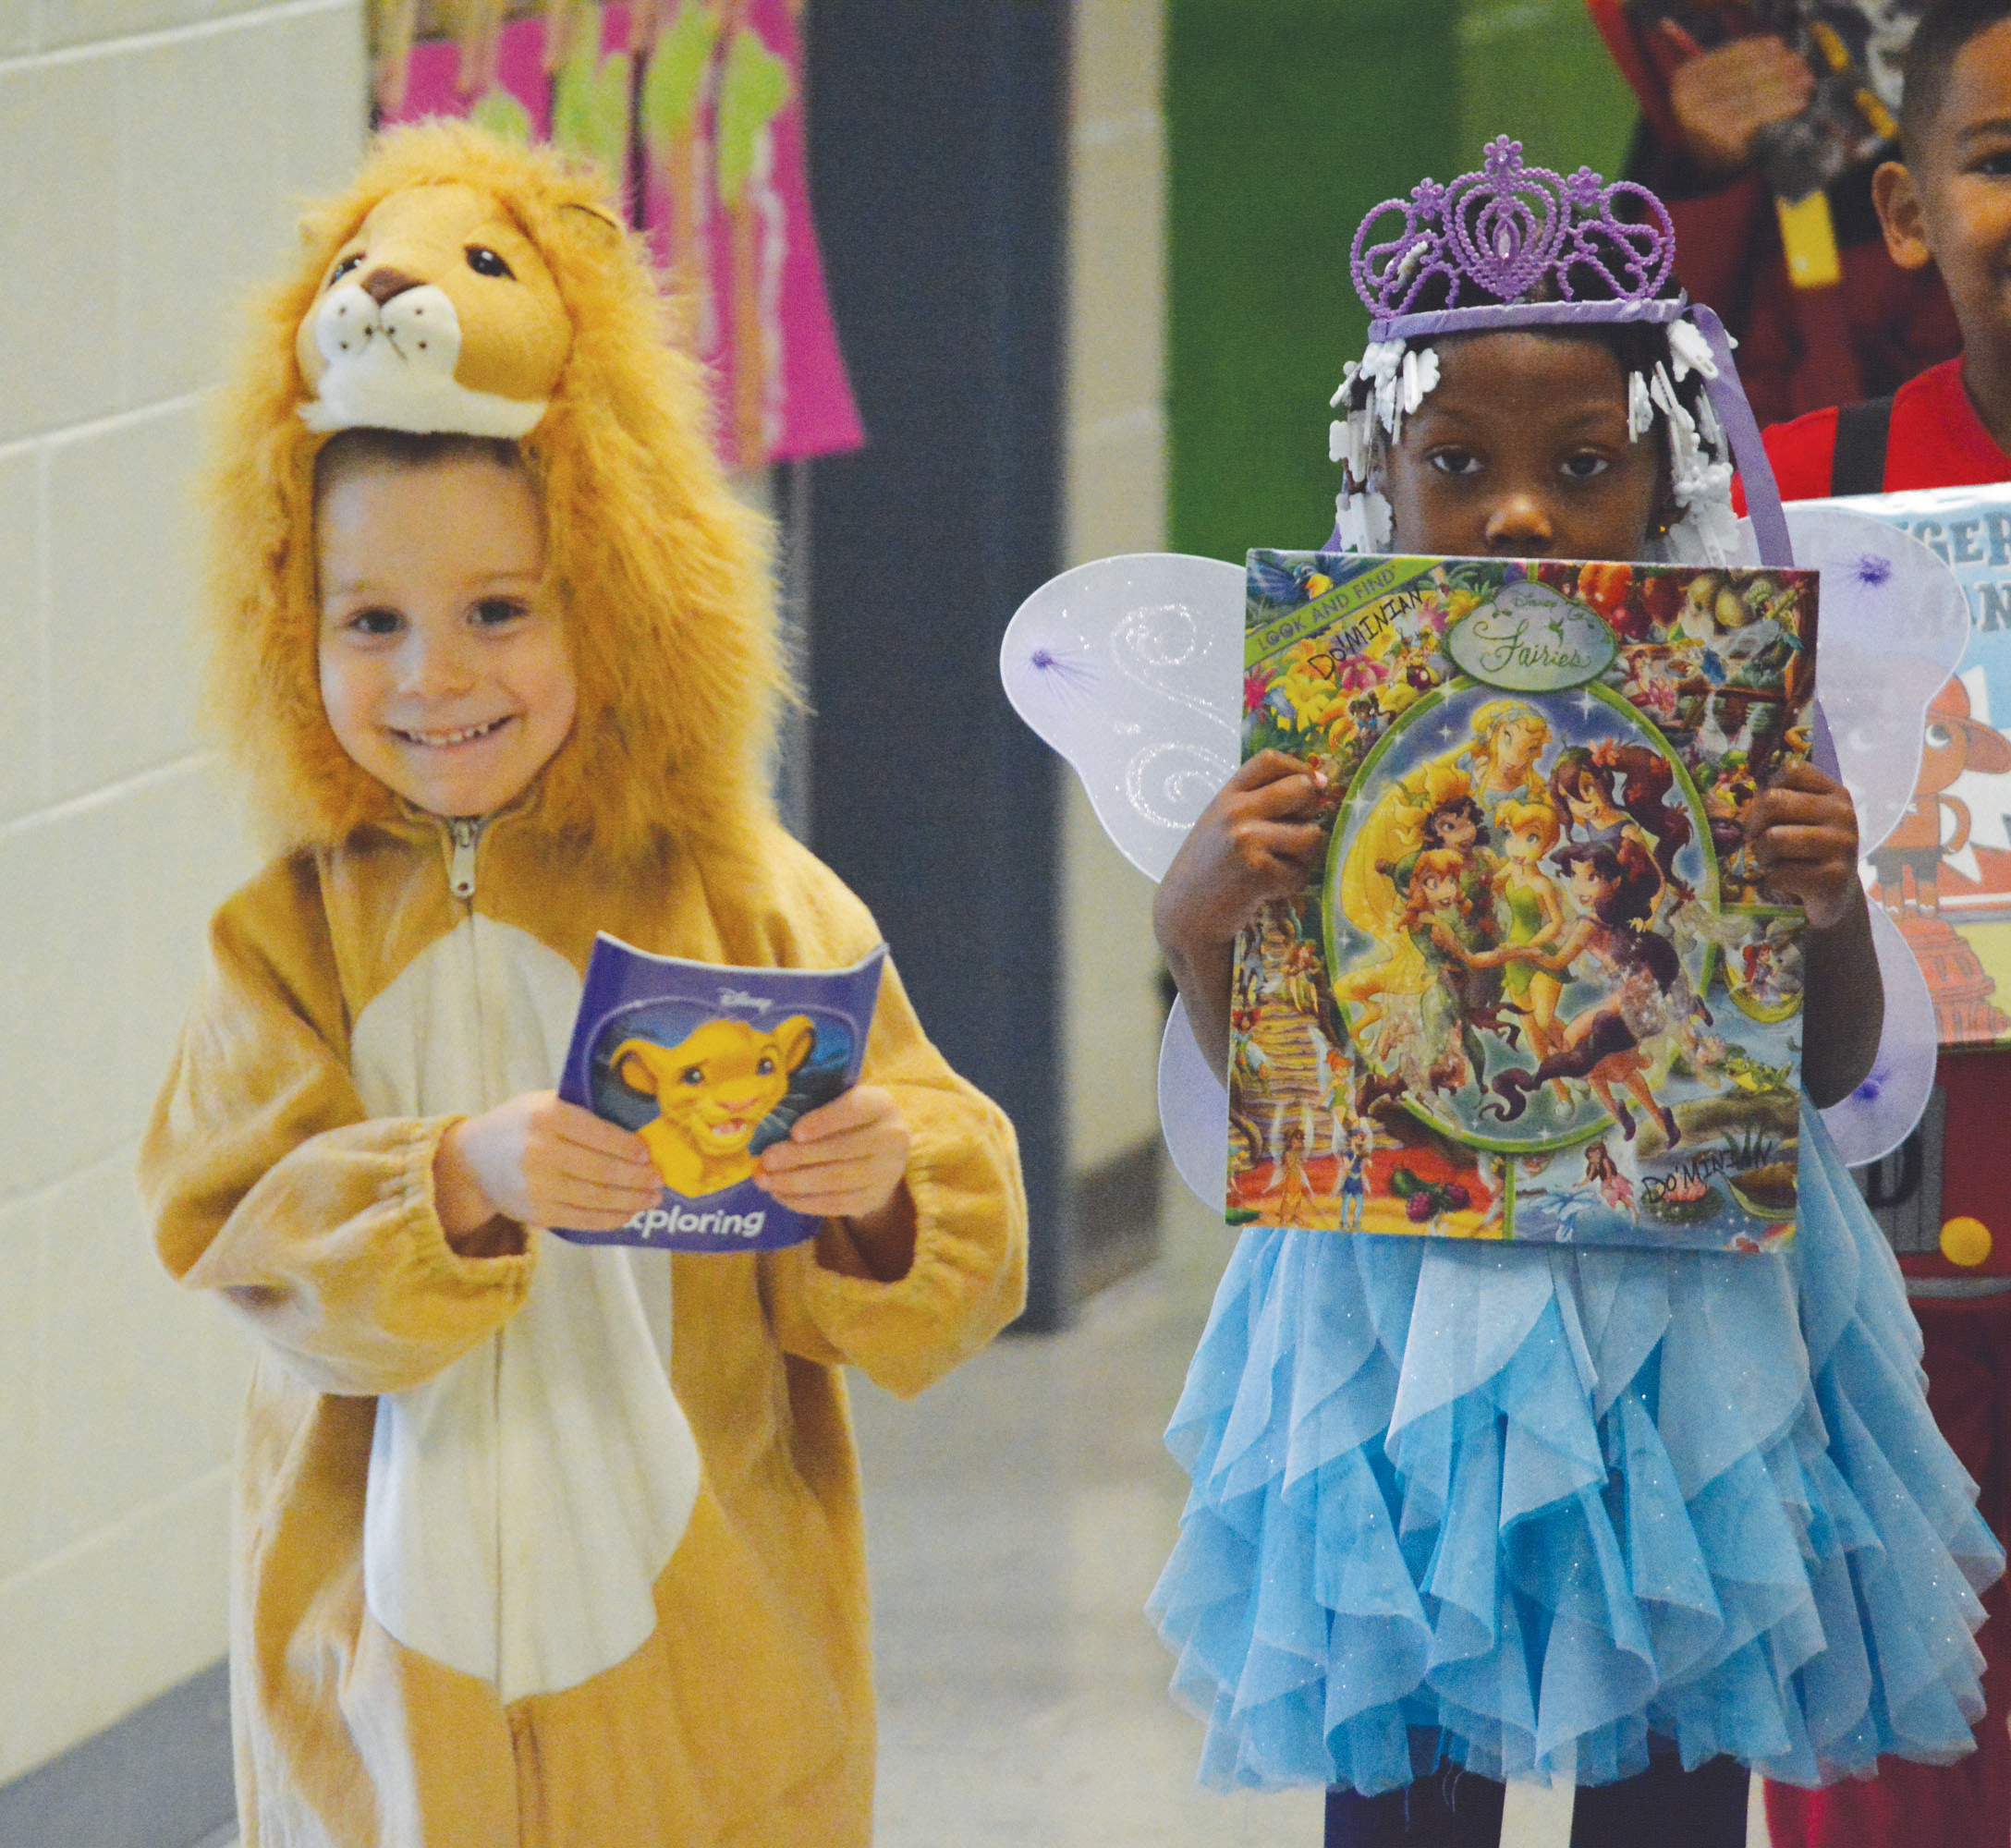 Sumter Elementary School Celebrates Favorite Storybook